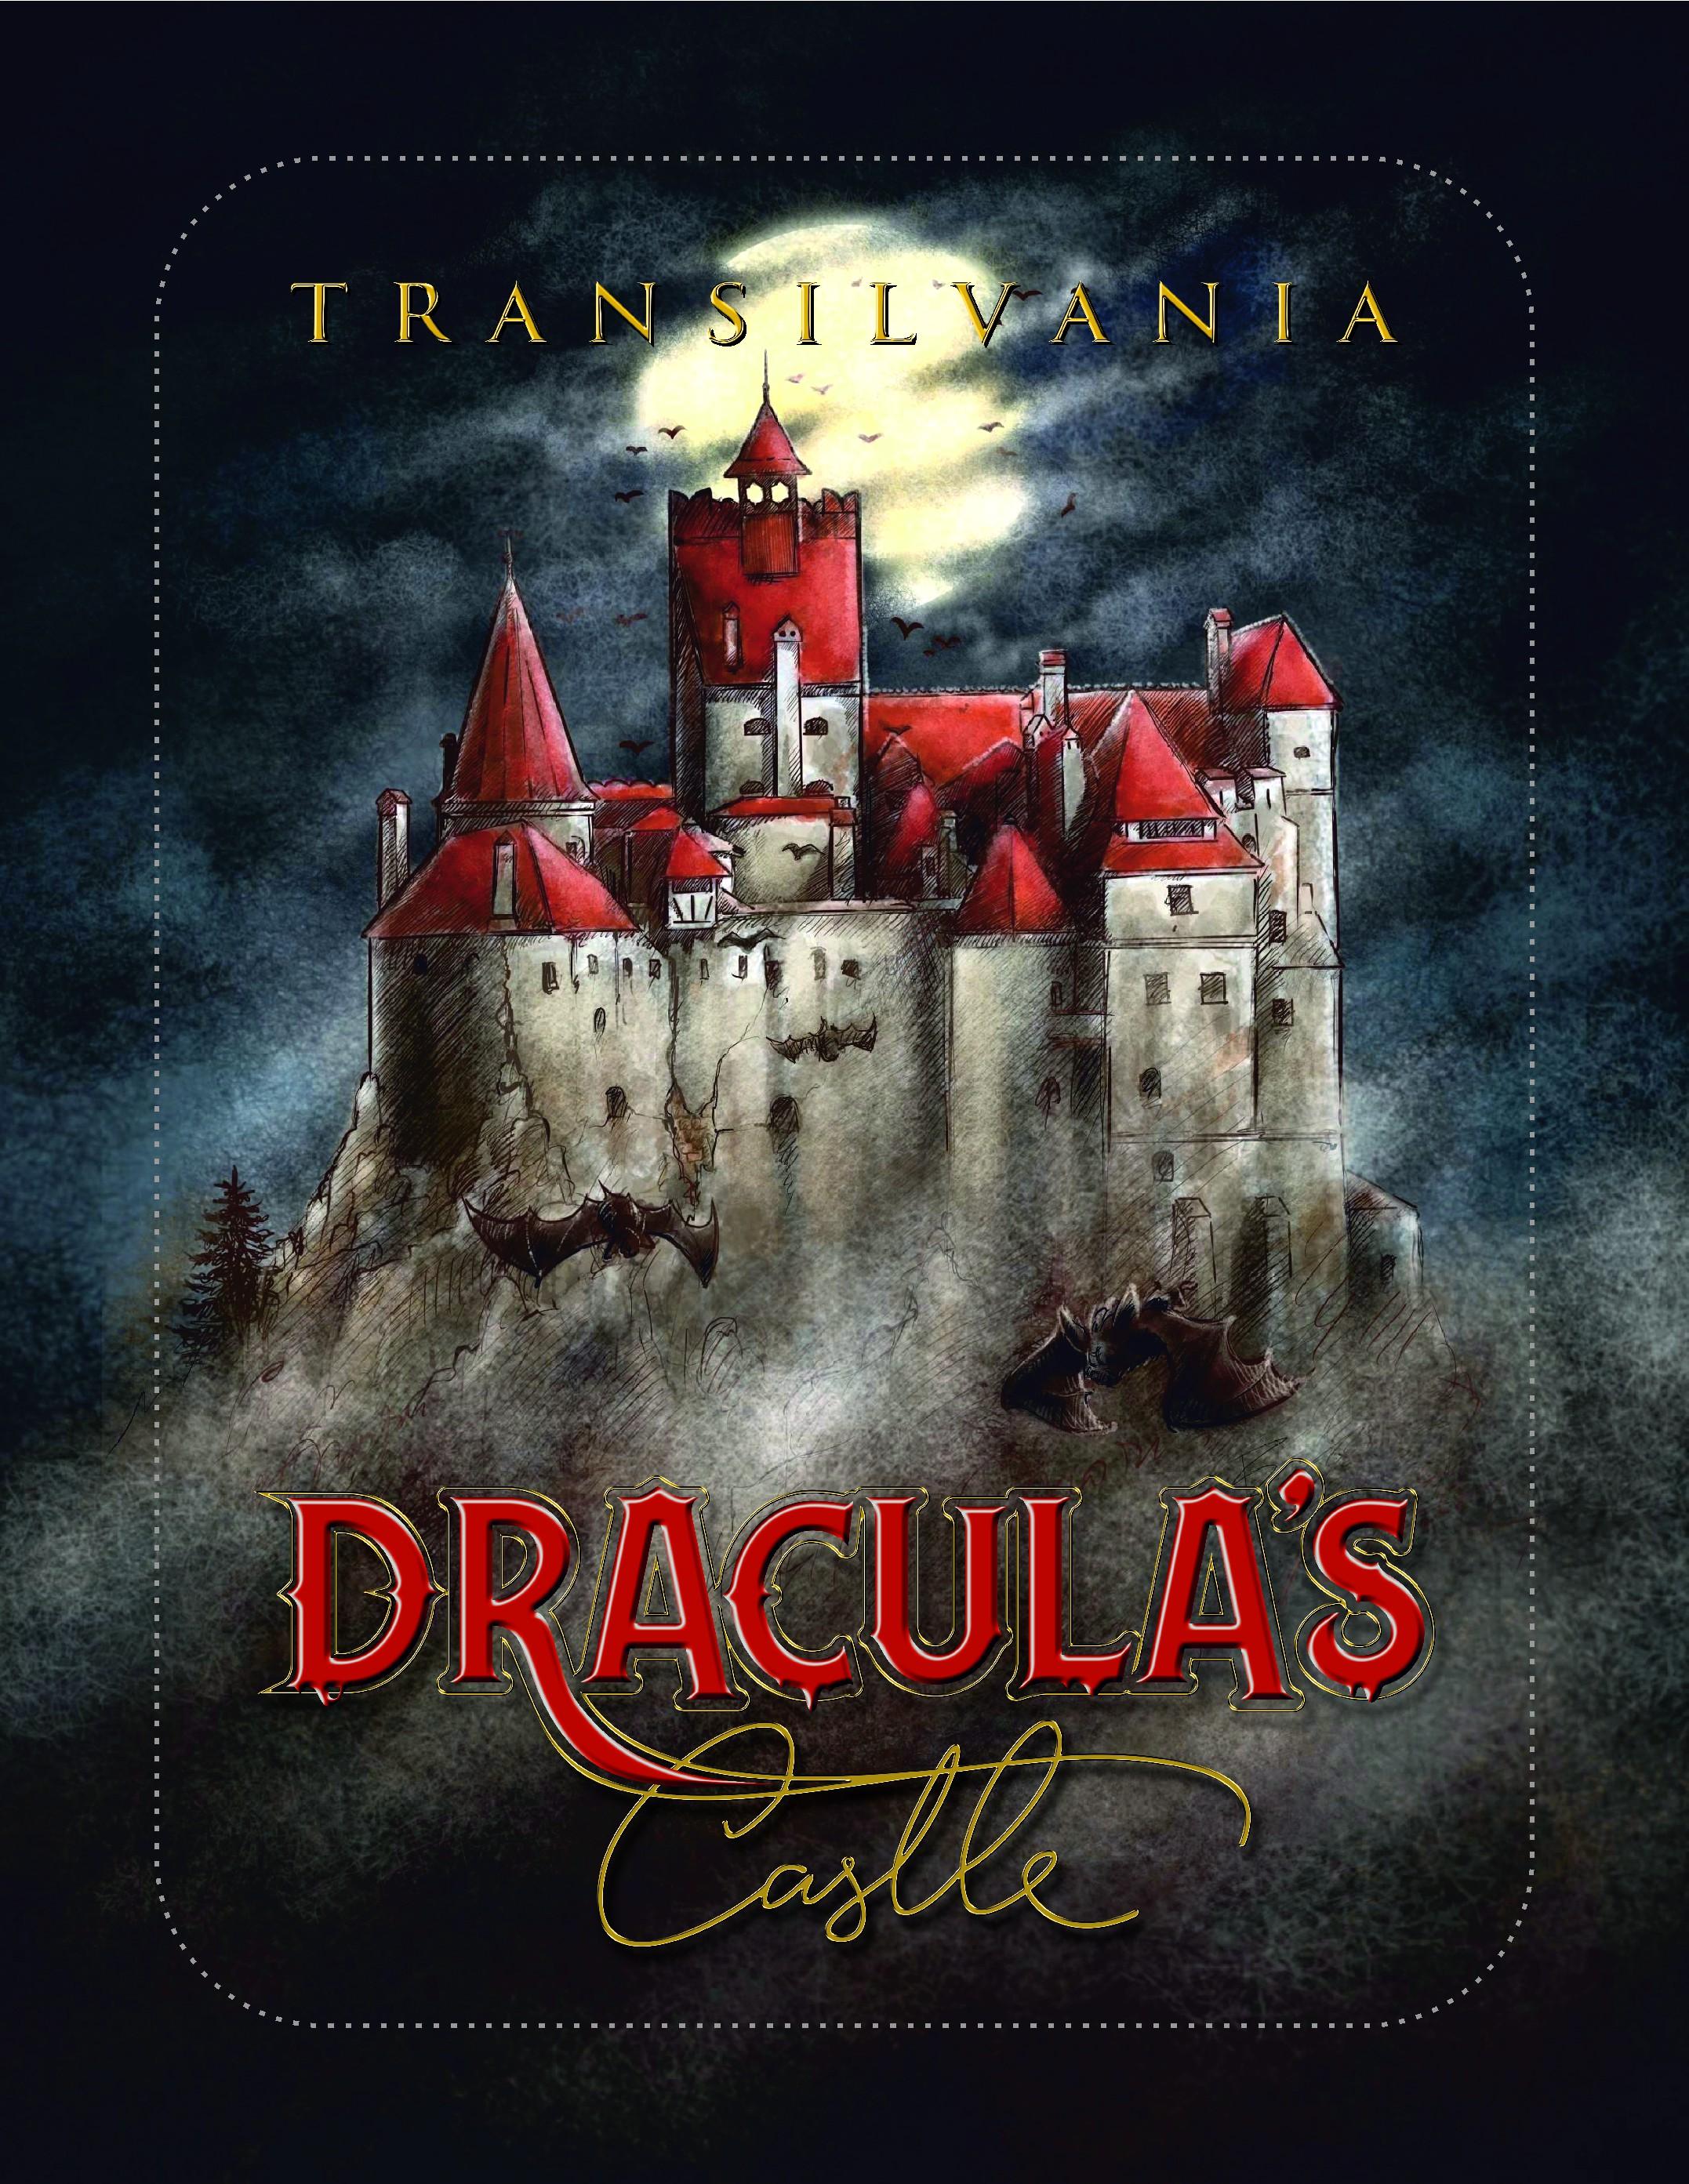 Dracula´s Castle Transylvania